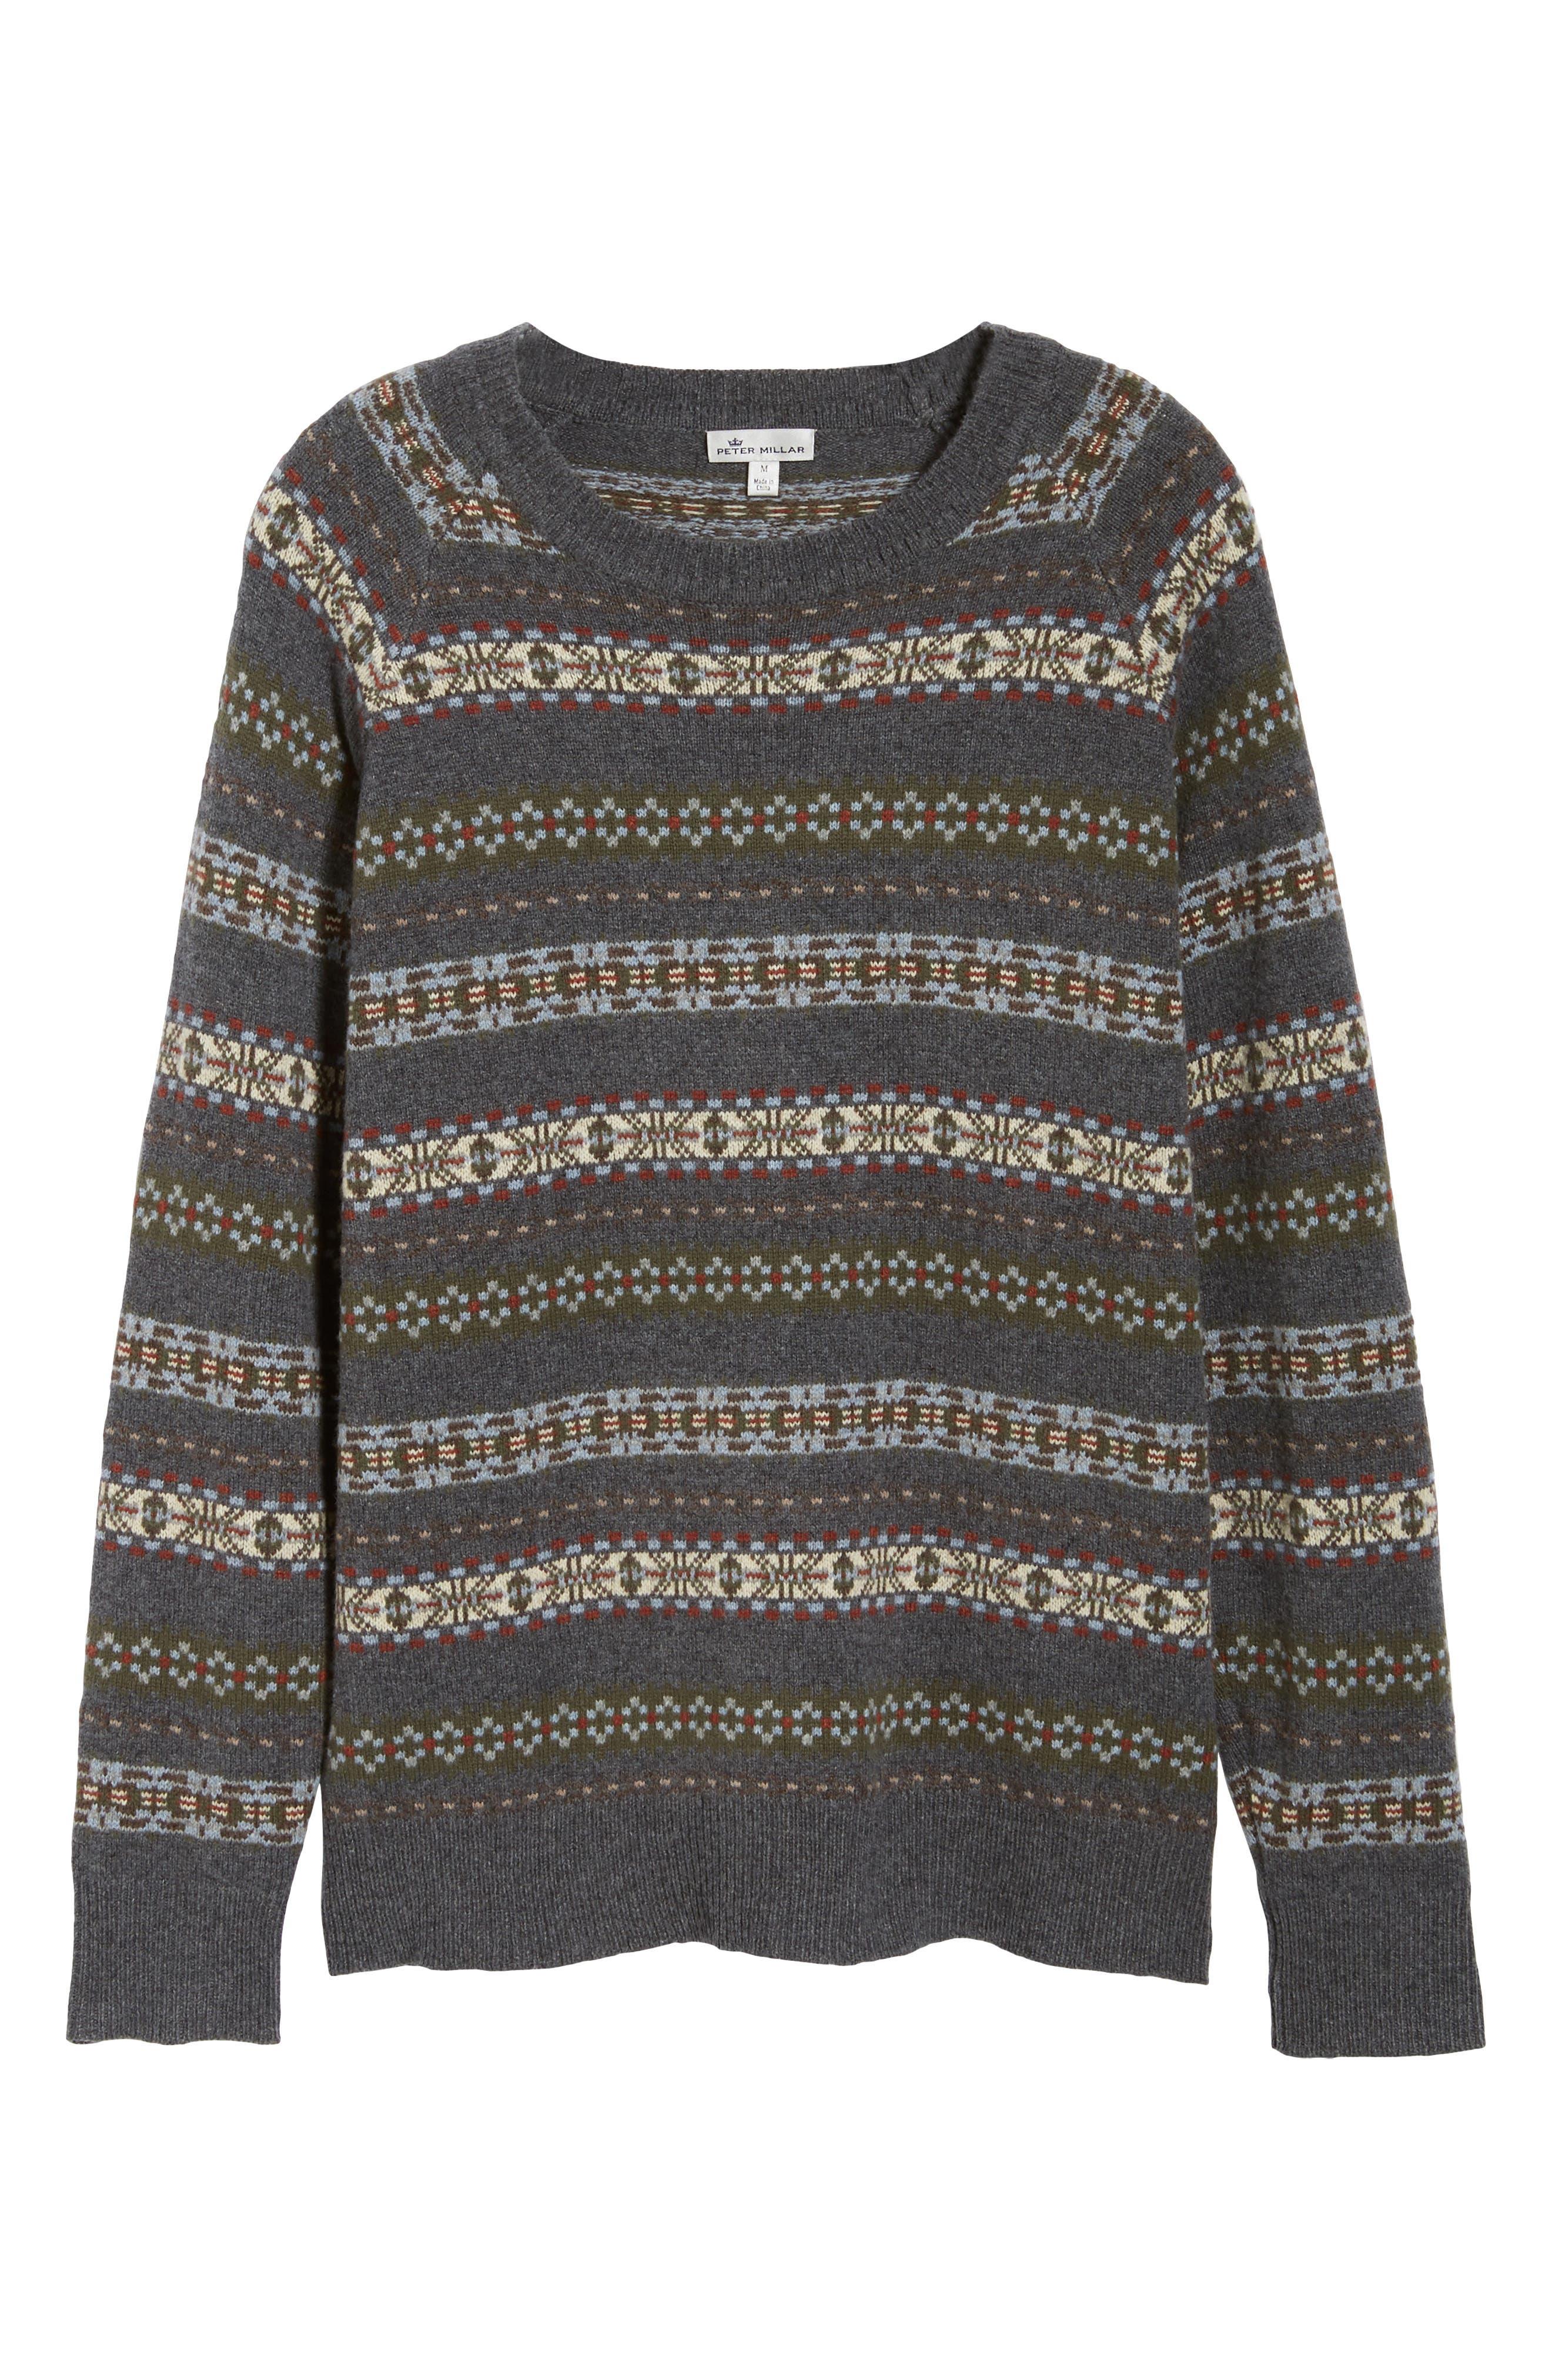 Mountainside Fair Isle Crewneck Sweater,                             Alternate thumbnail 6, color,                             017